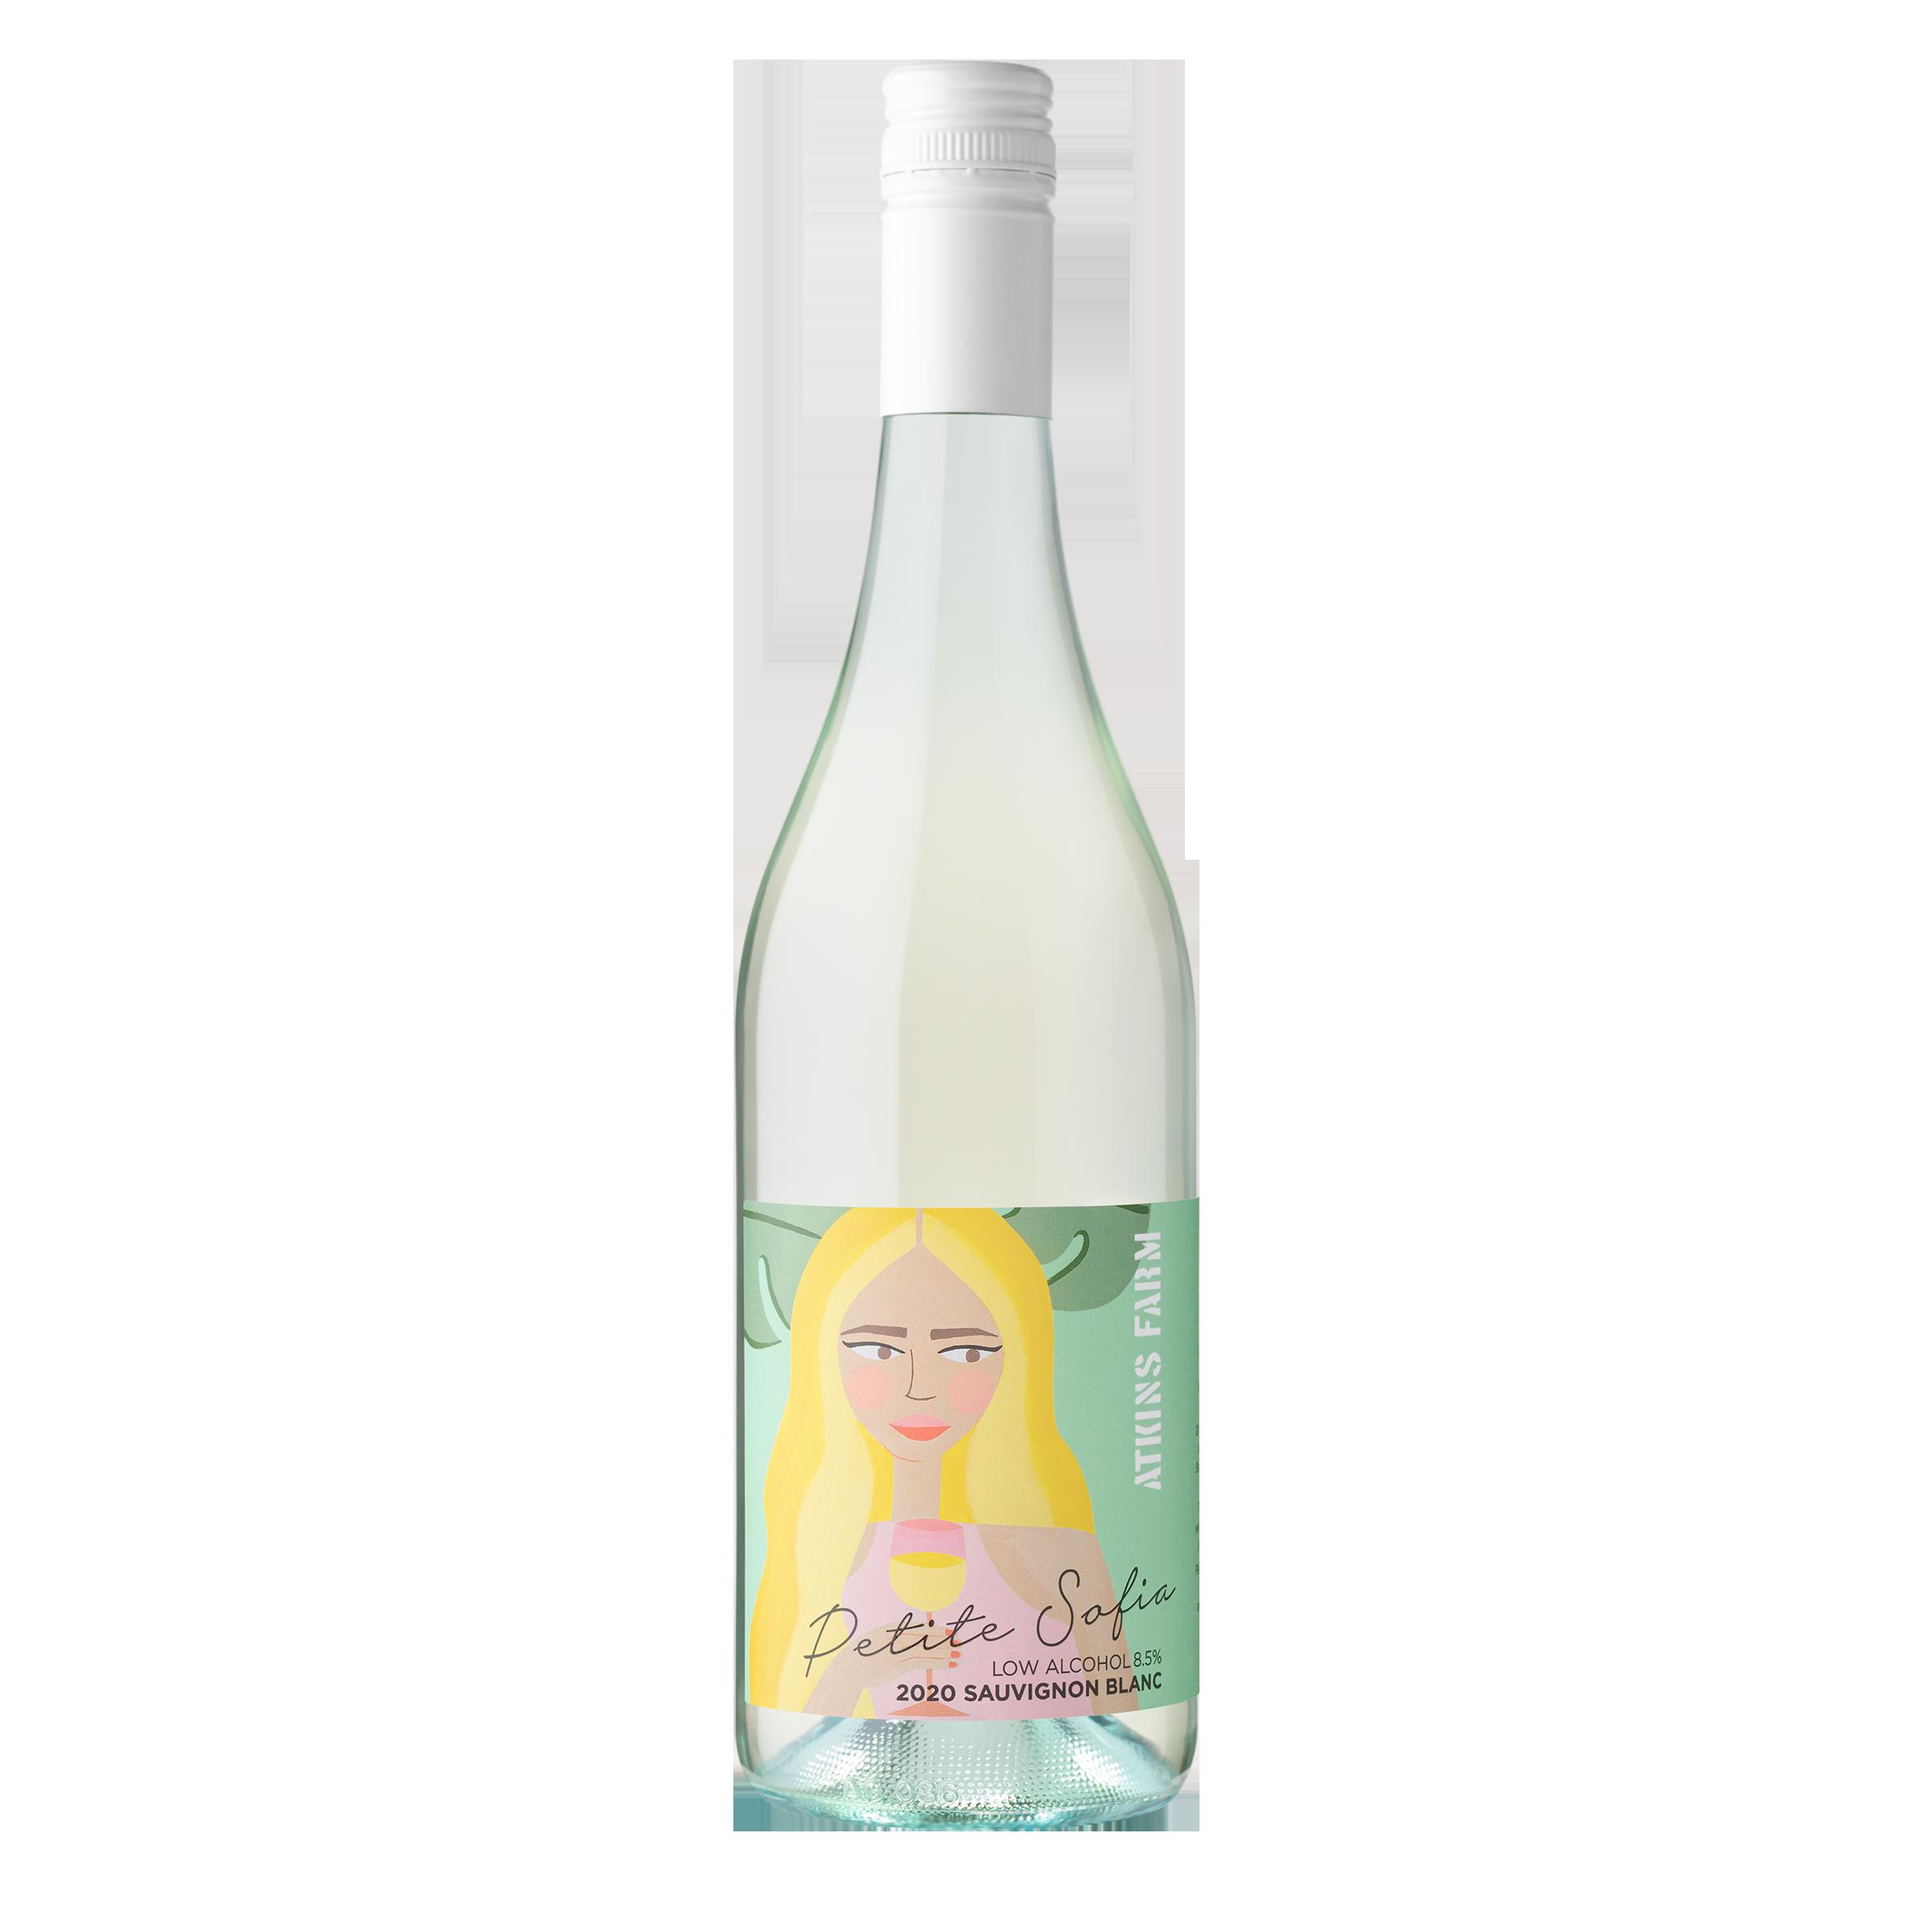 Atkins Farm 'Petite Sofia' Low-Alc Sauvignon Blanc